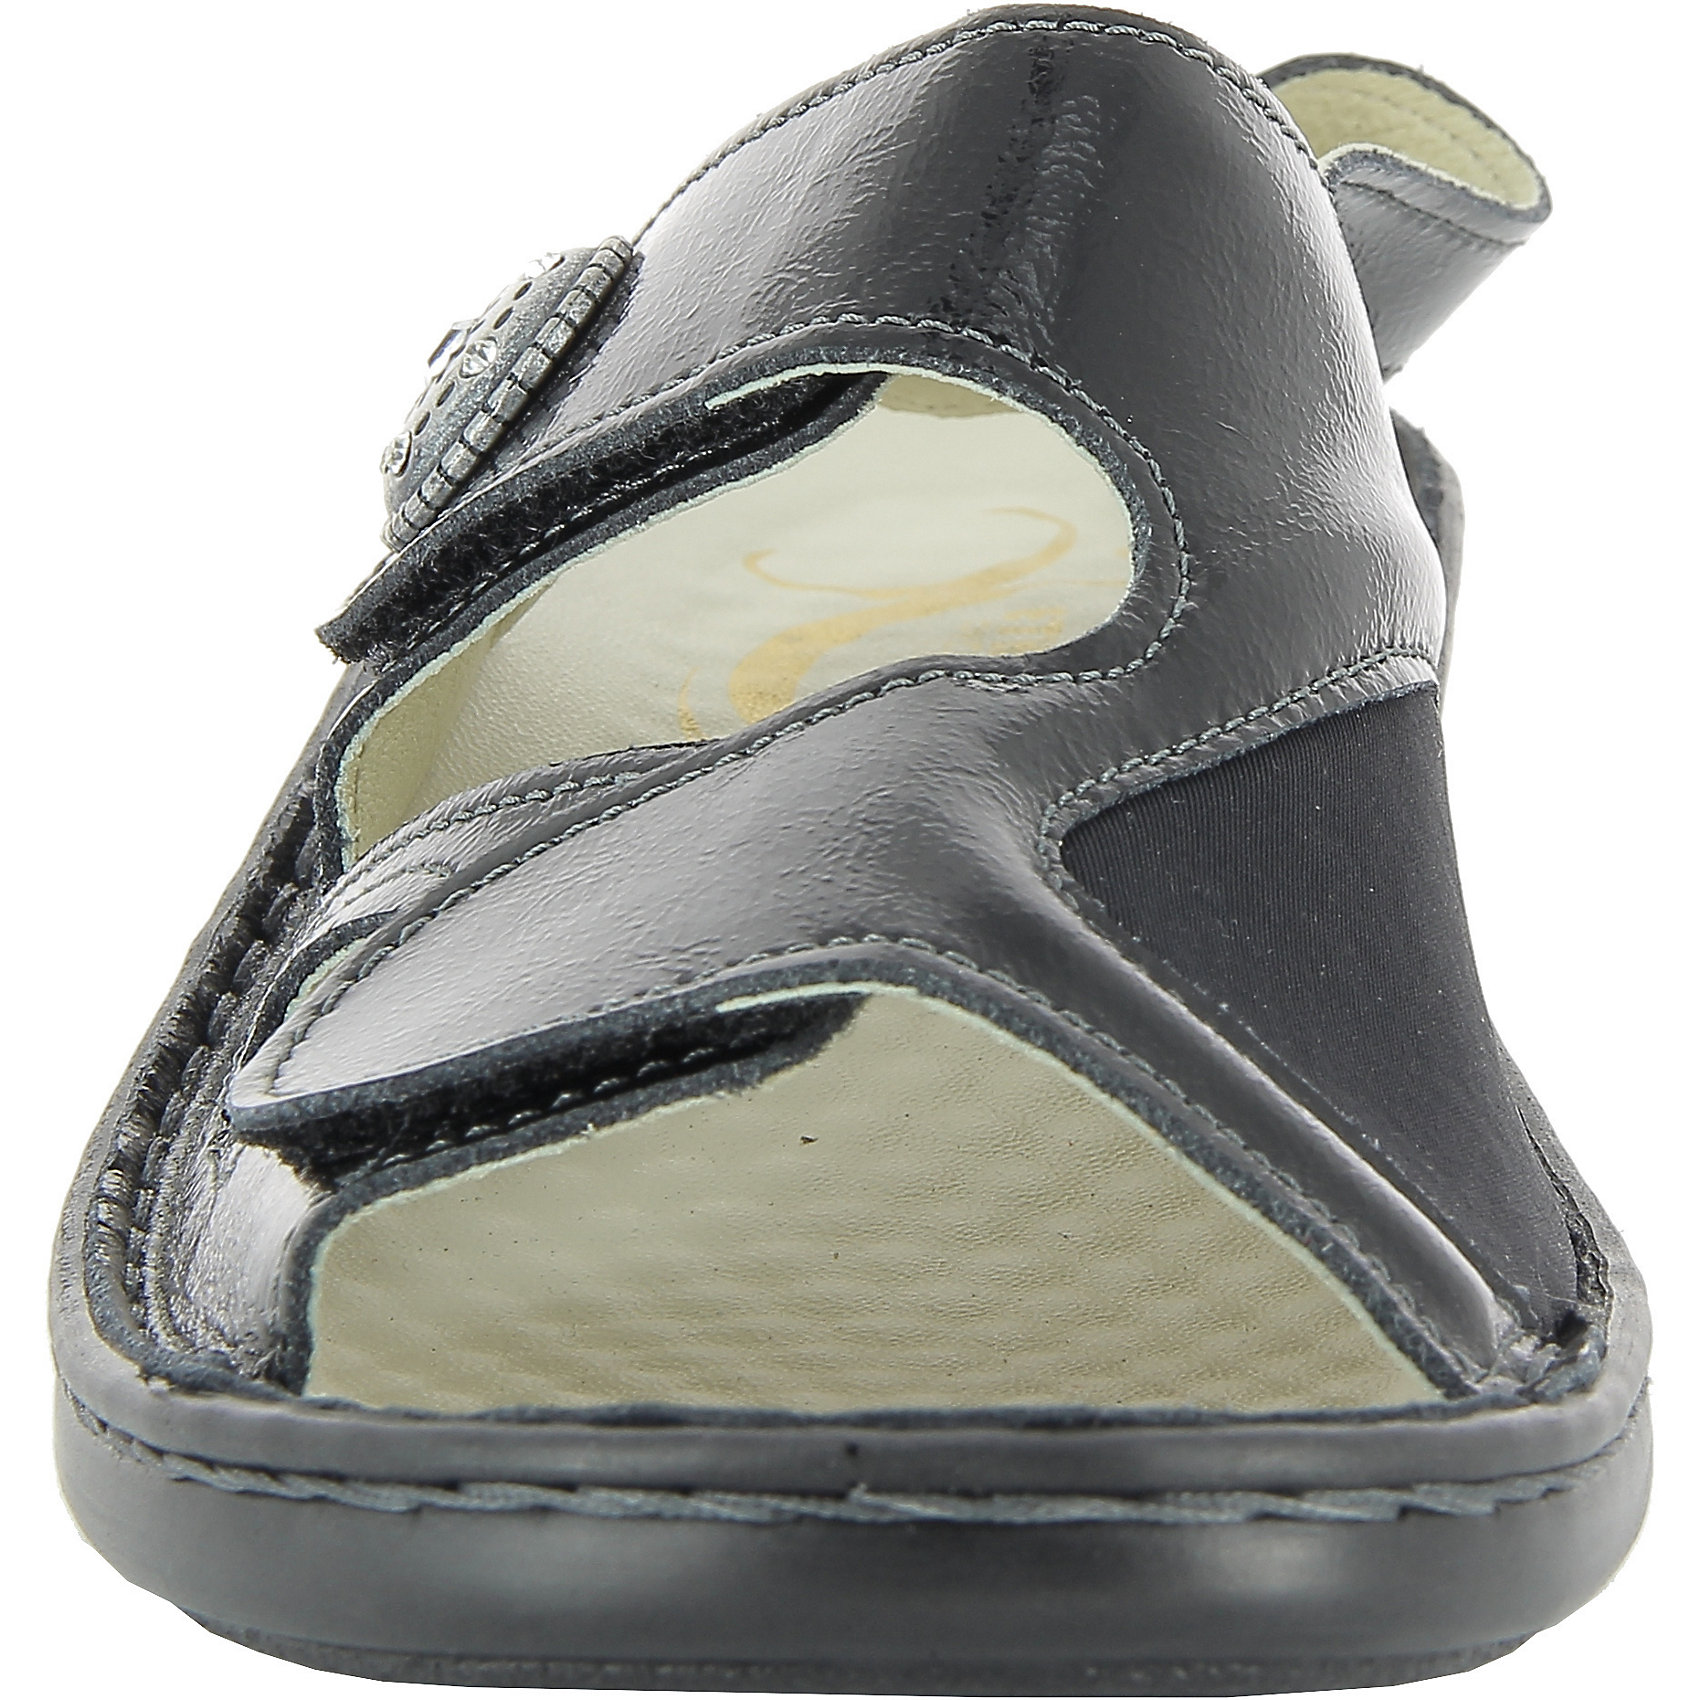 Neu Florett Isabell  Komfort-Sandalen schwarz 7210627 für Damen schwarz Komfort-Sandalen fd471c